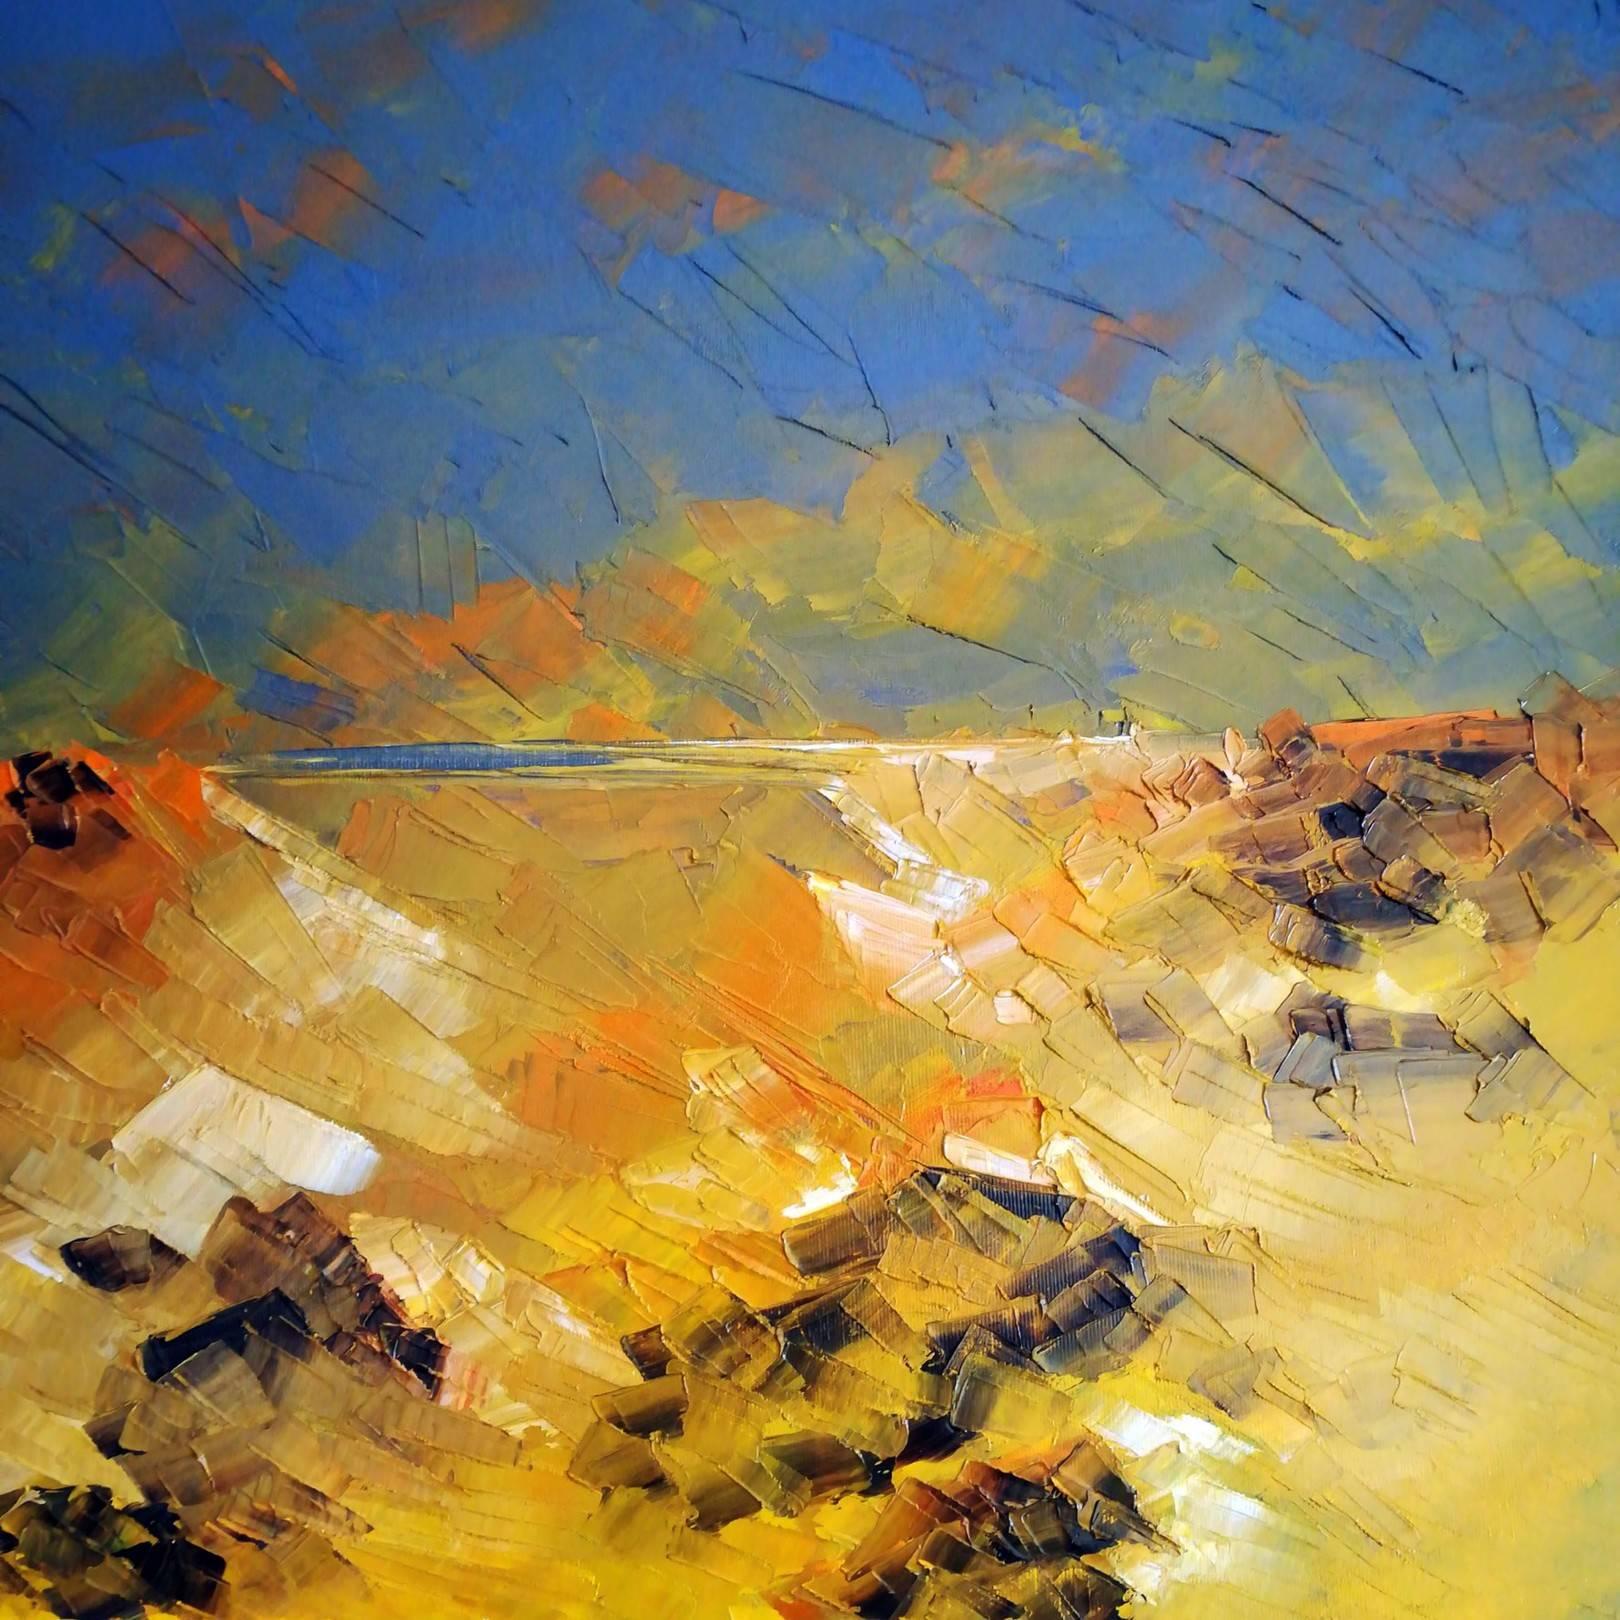 """The green cottage."" Sierra de Cabo de Gata. oil spatula canvas.  39.5 x 39.5 cm. http://bohemiogus.blogspot.com/ http://www.facebook.com/atomista"